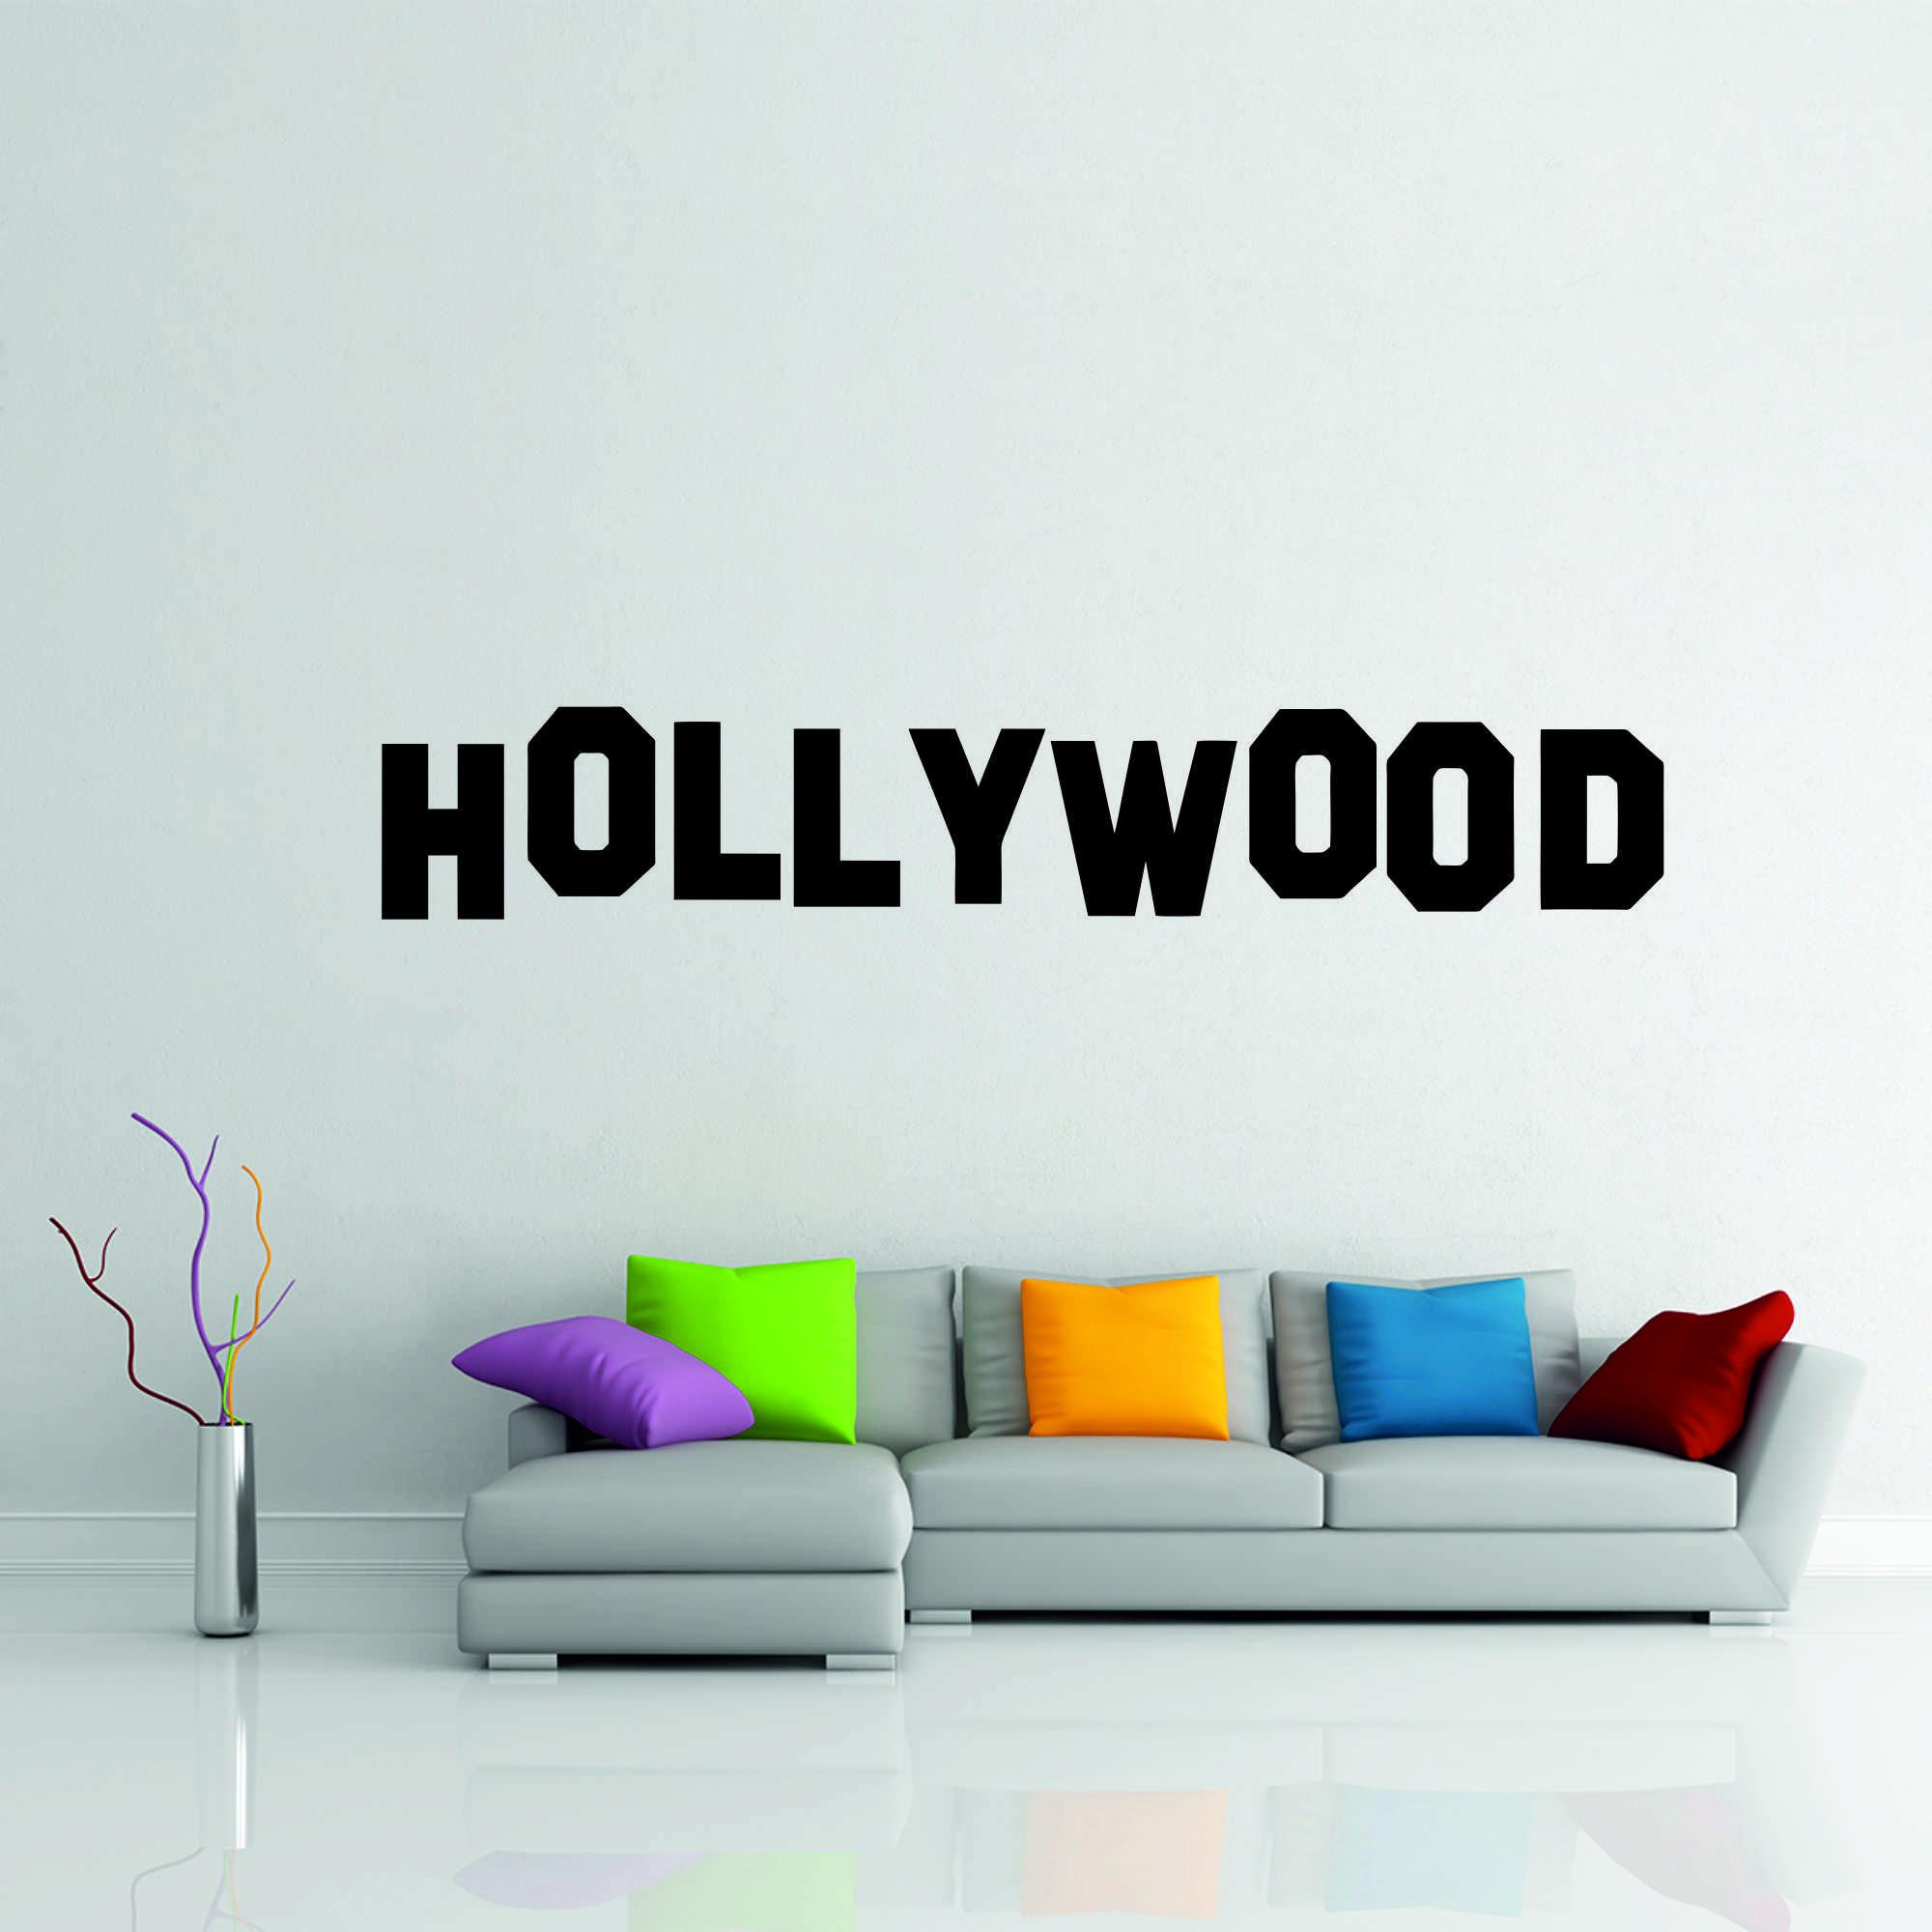 Samolepka na zeď - Hollywood nápis - 60x10cm - PopyDesign